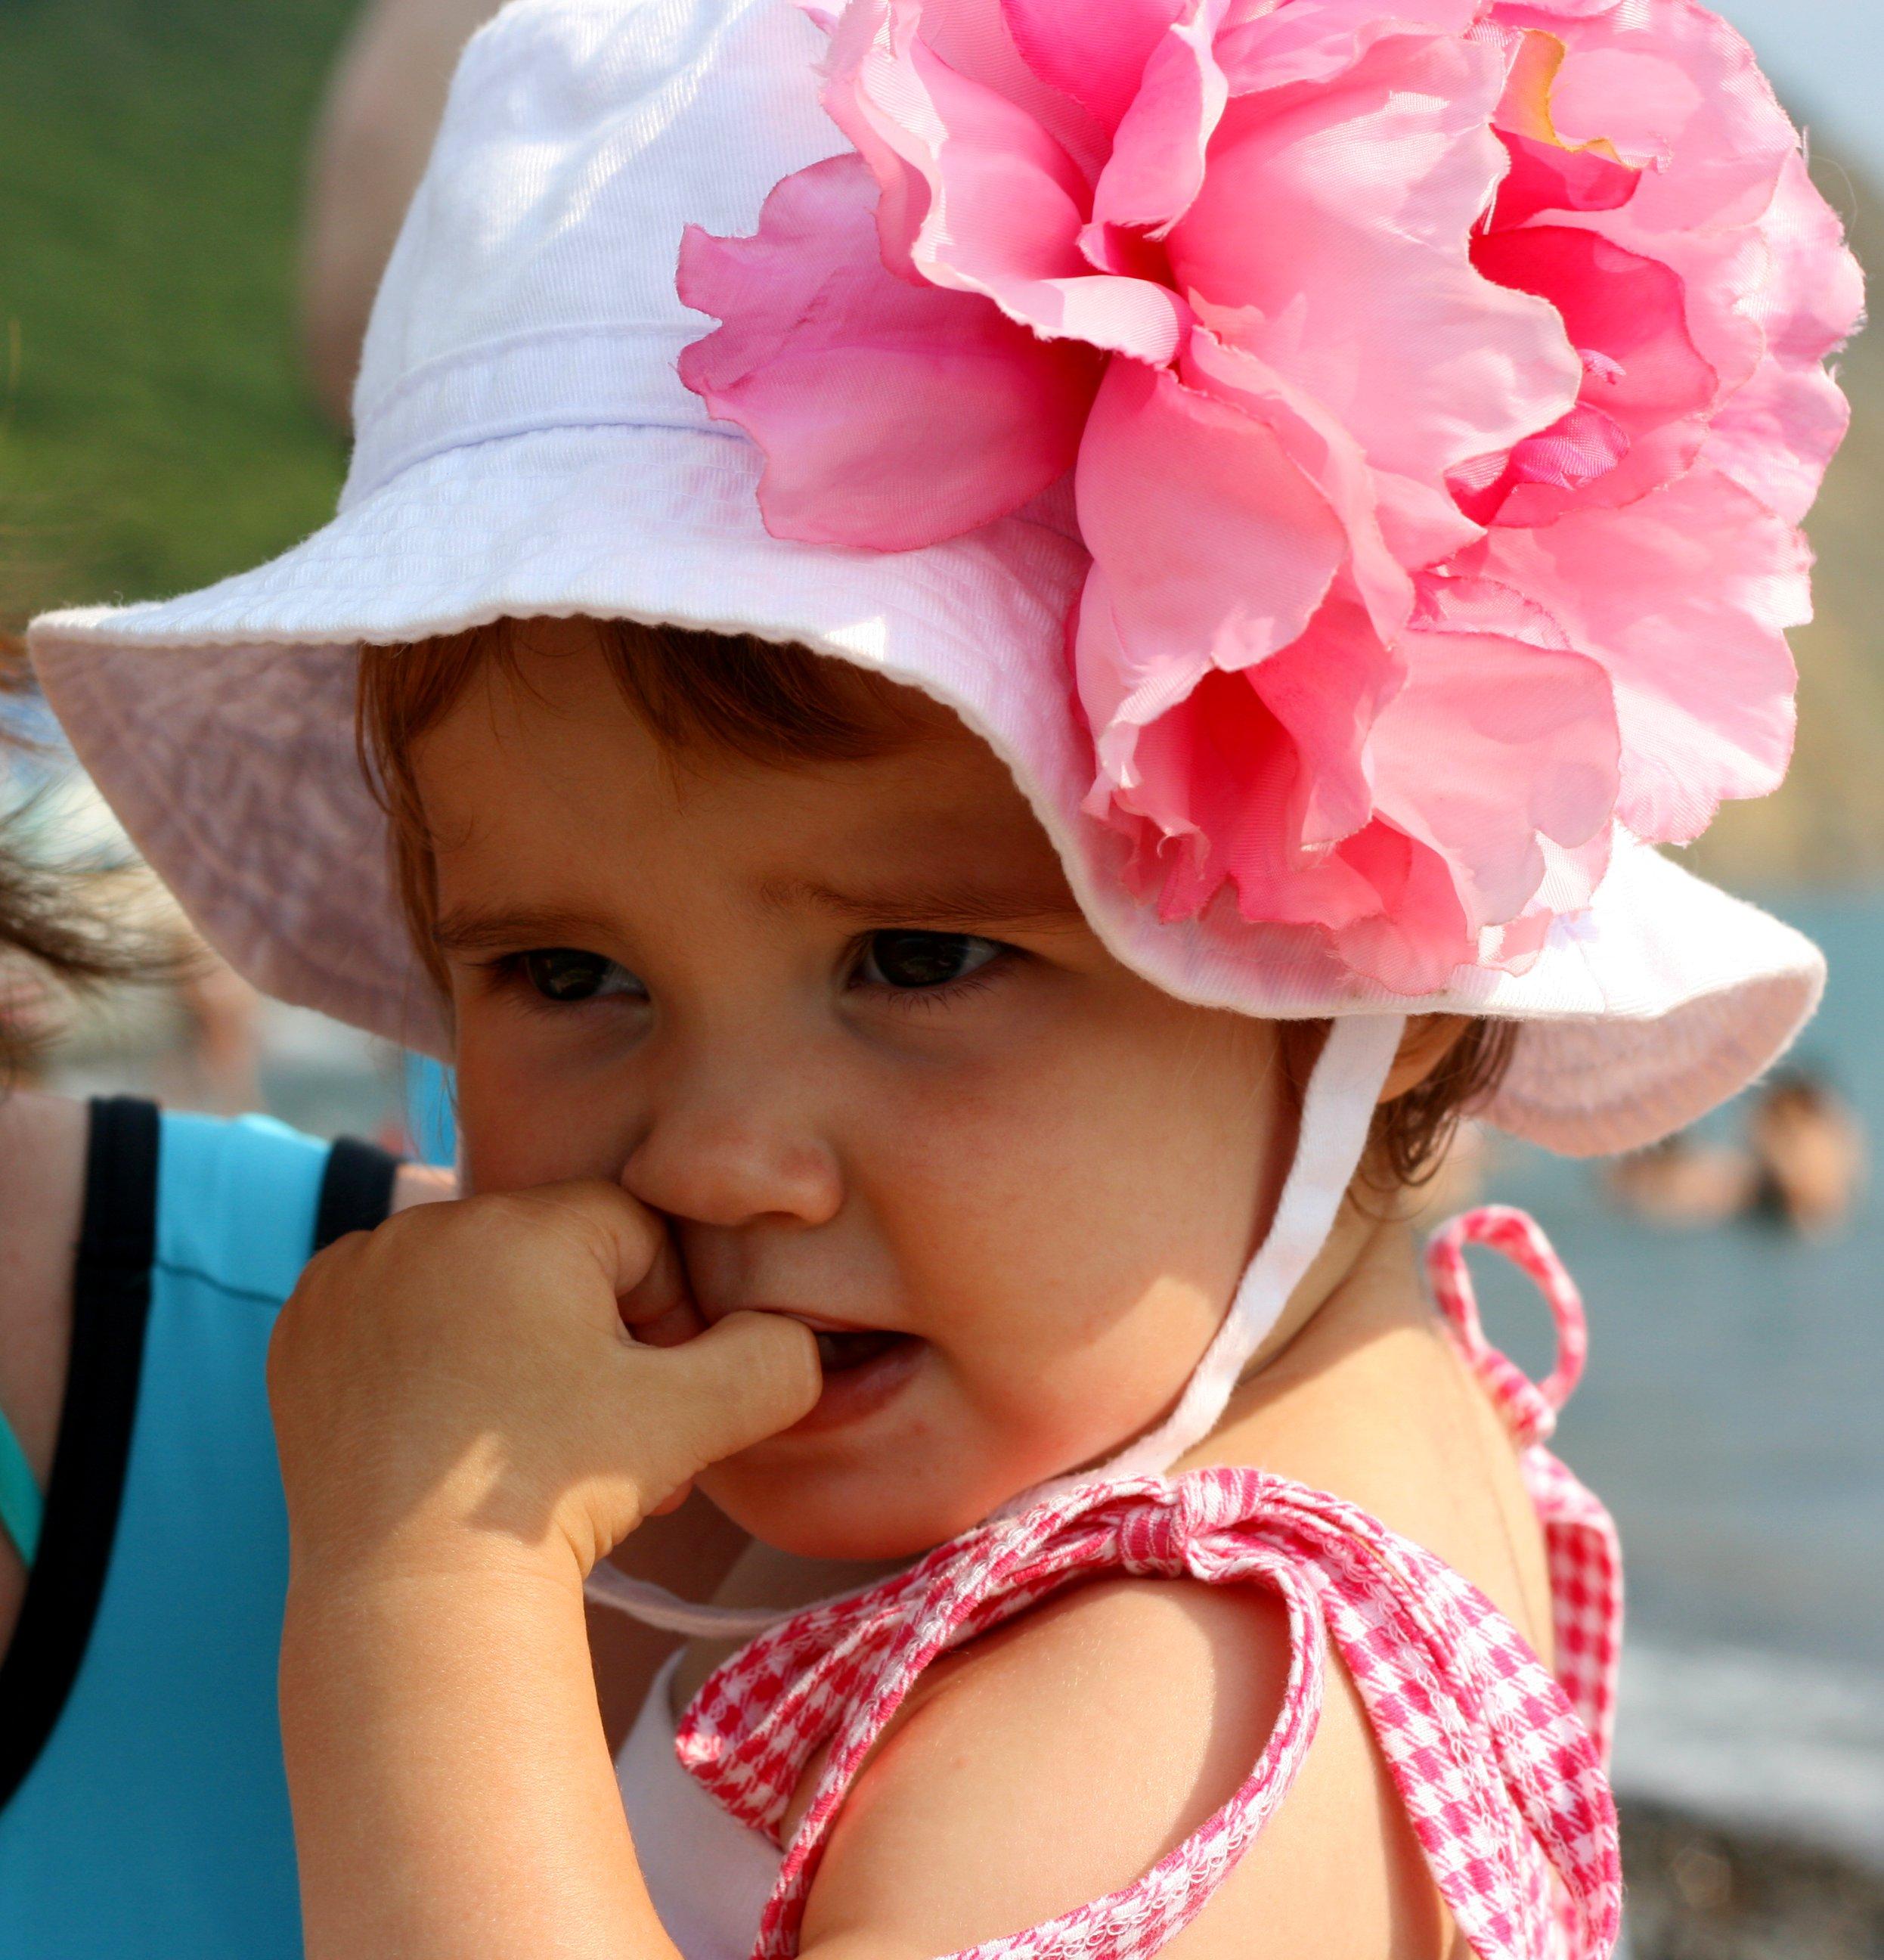 Елизавета, 1 год и 9 месяцев. Перламутринки